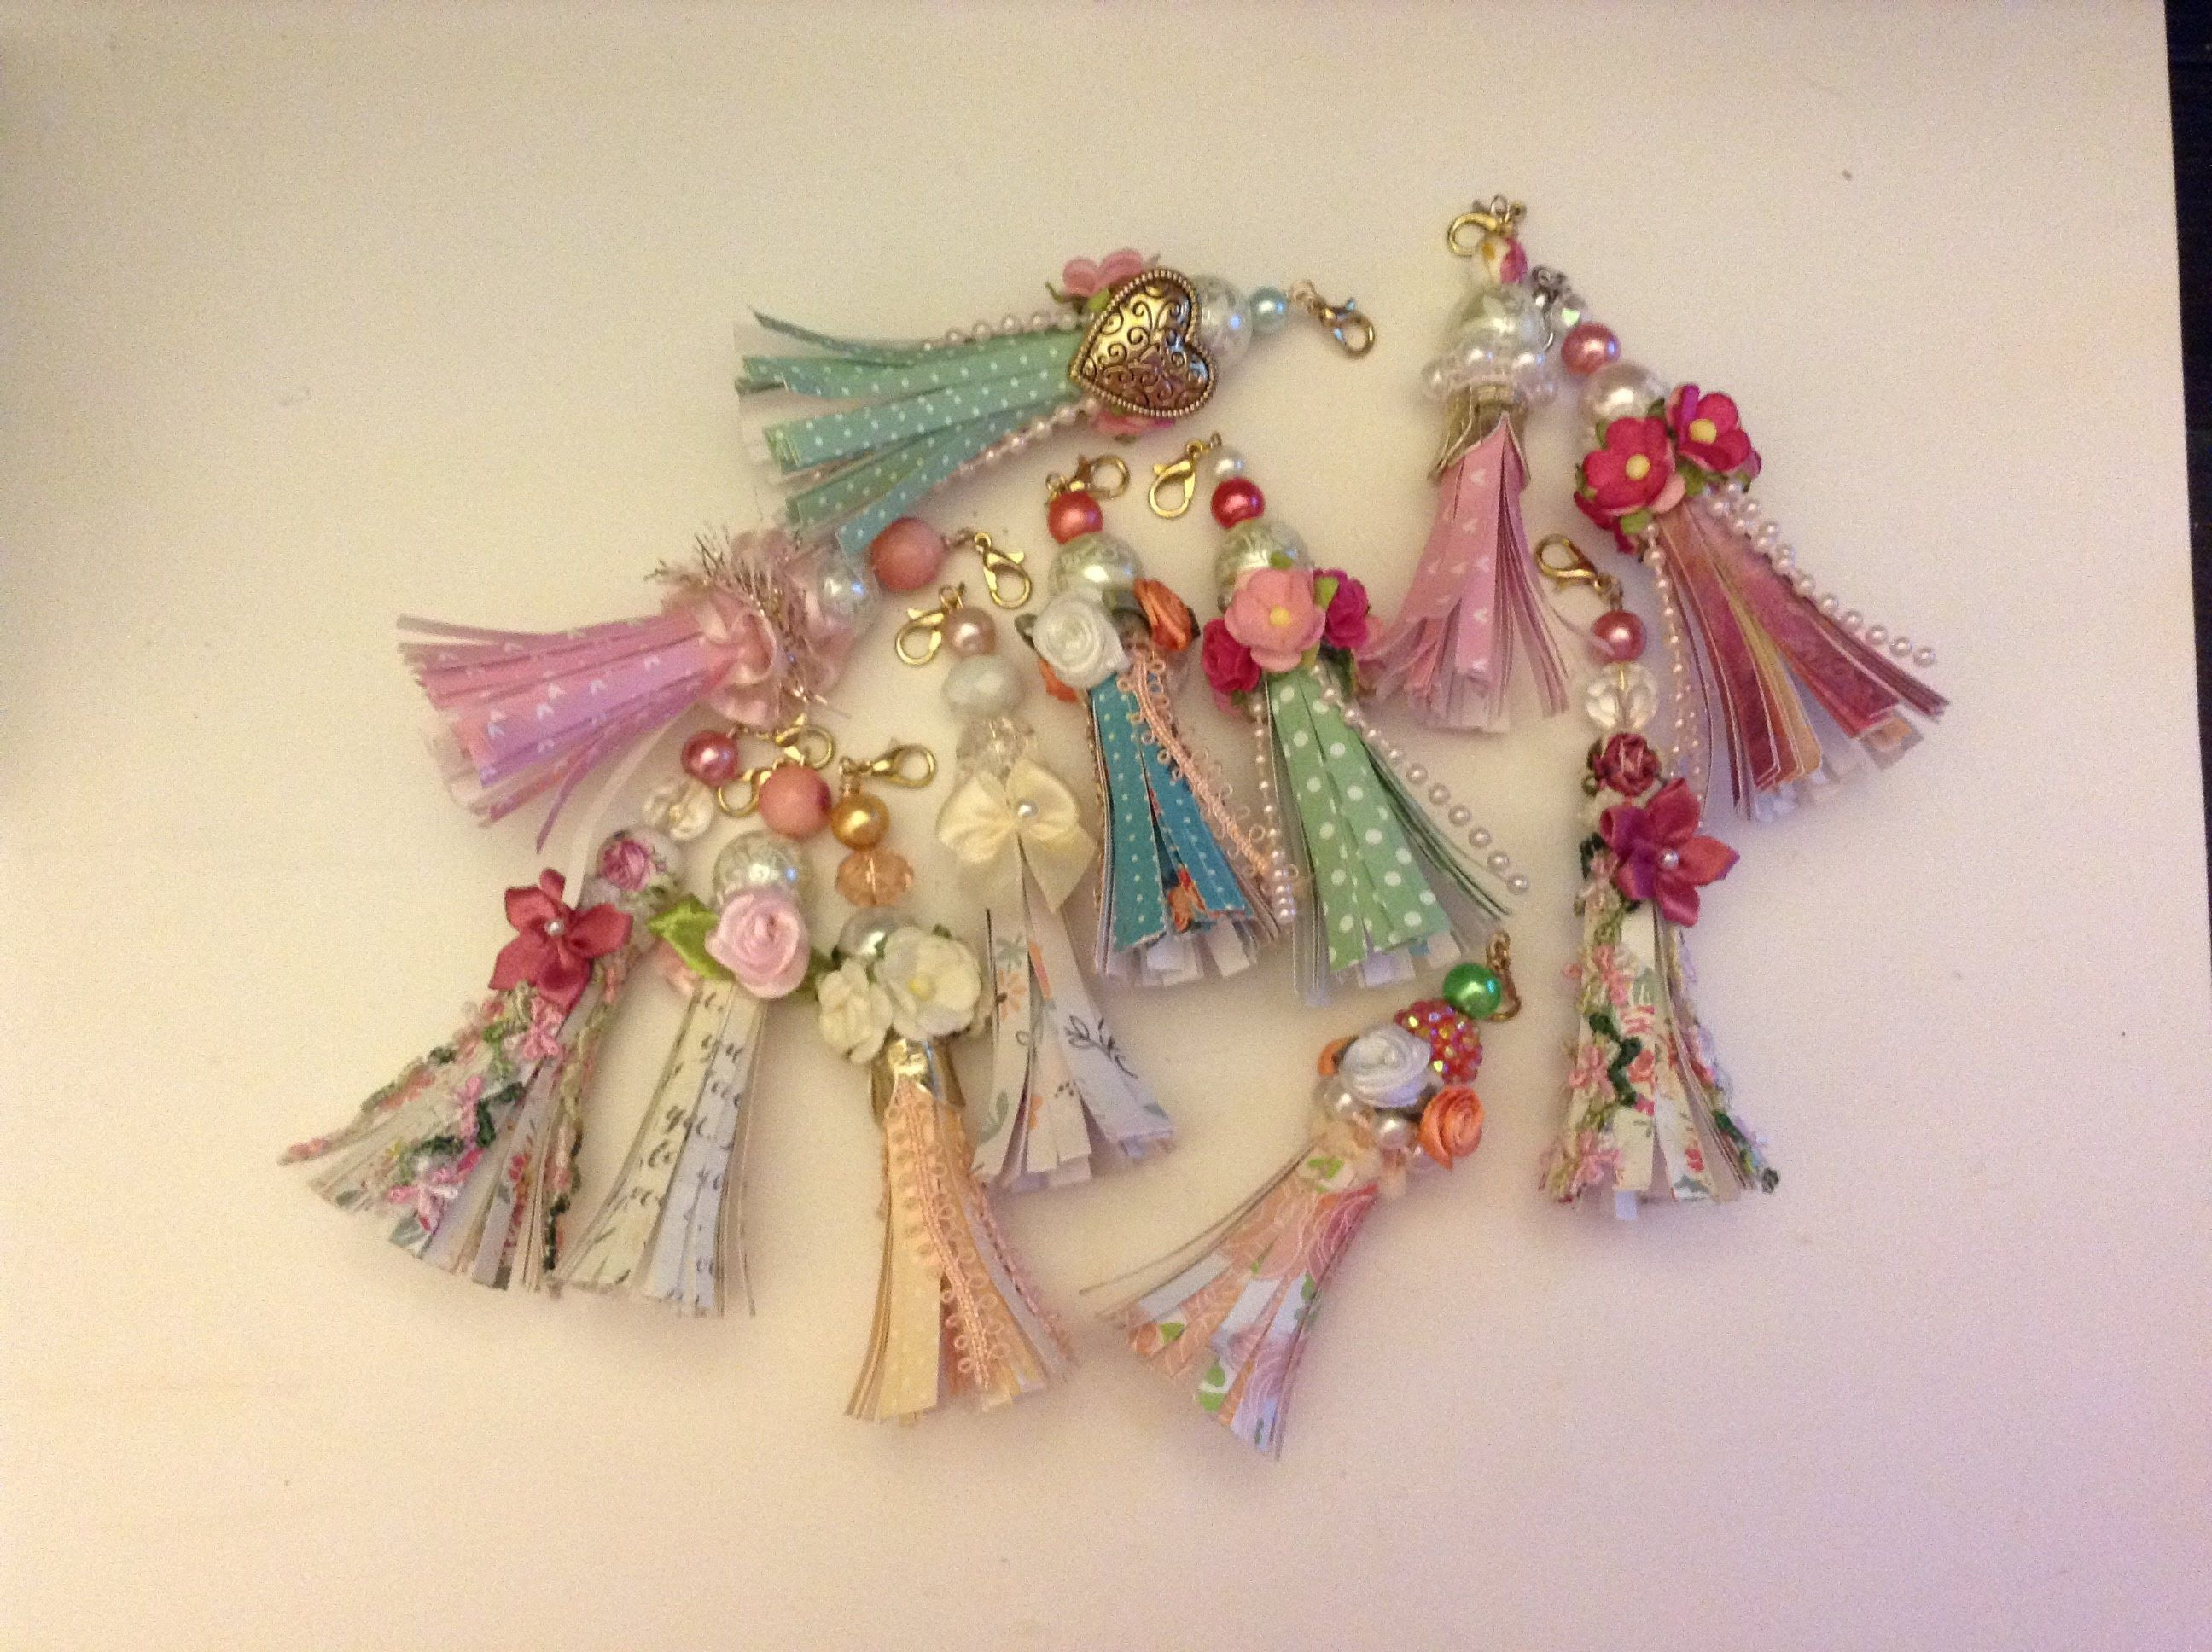 Boho Tassel with Hand Beaded Tassel Topper Sari Silk Tassels Junk Journal Embellishments